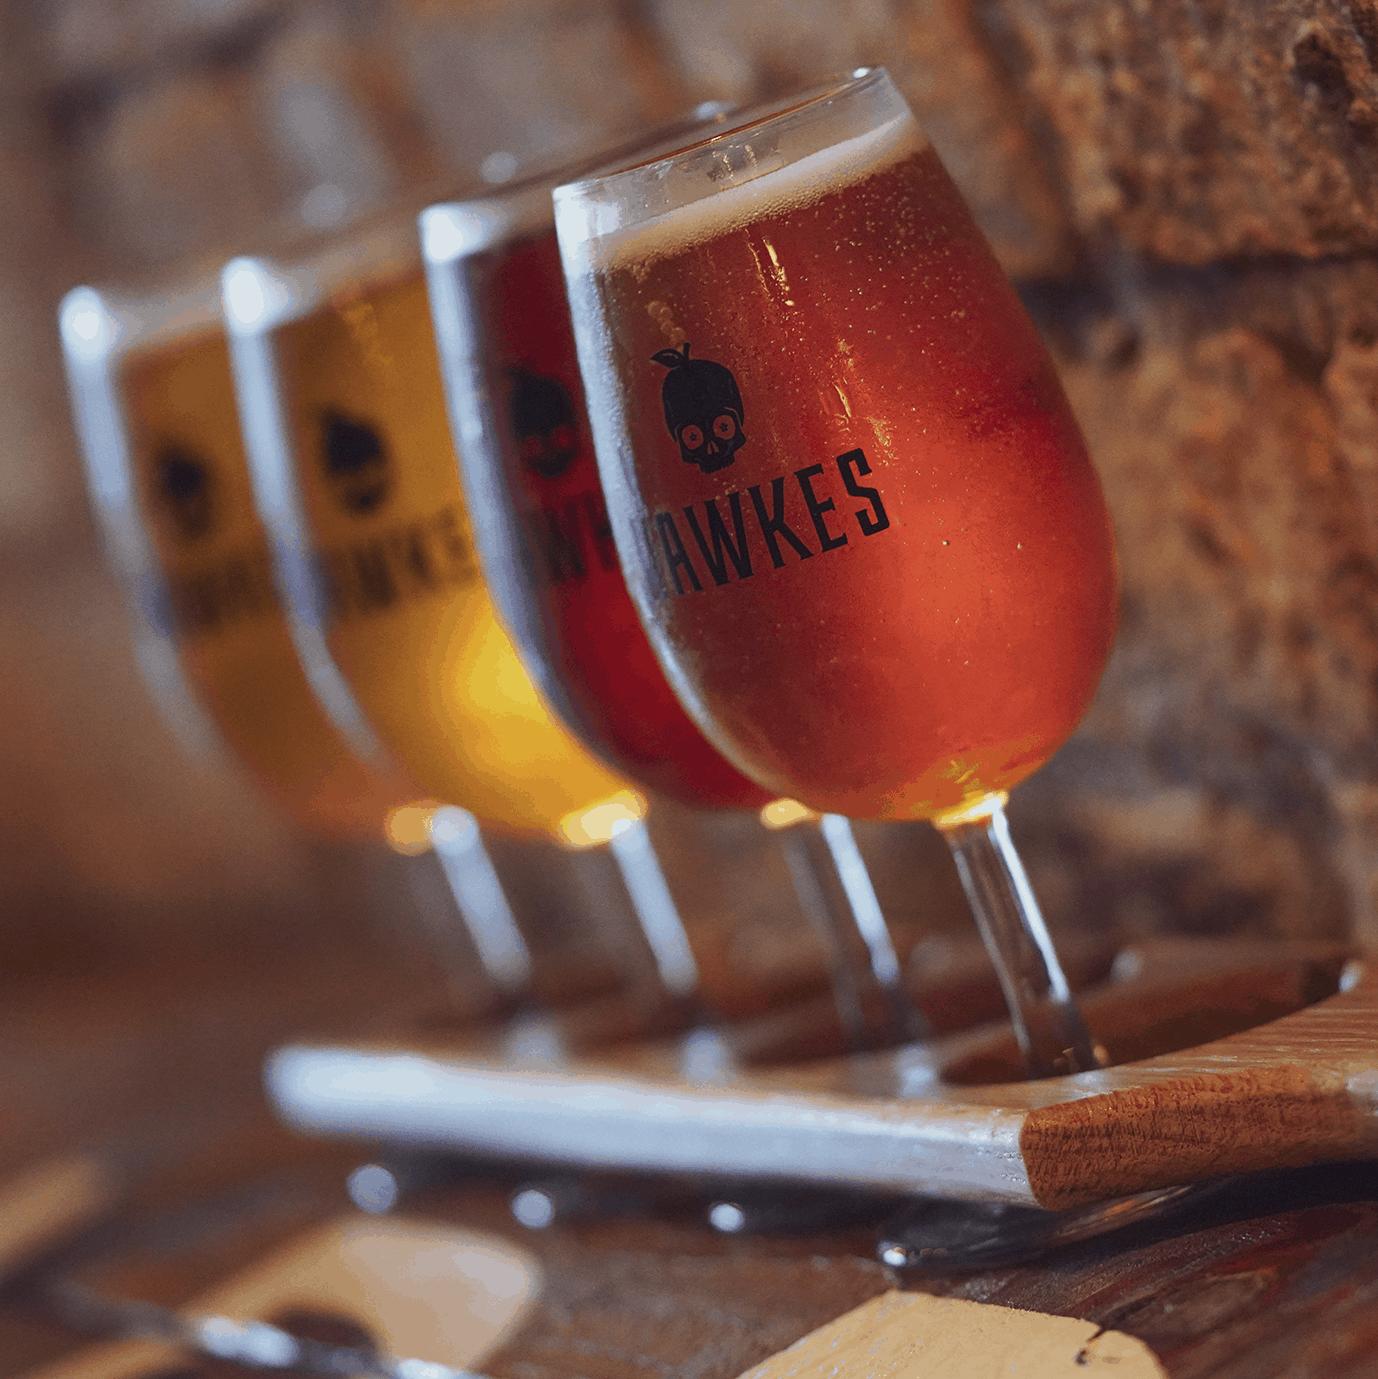 Hawkes Cider Flight Beer Delivery Covid-19